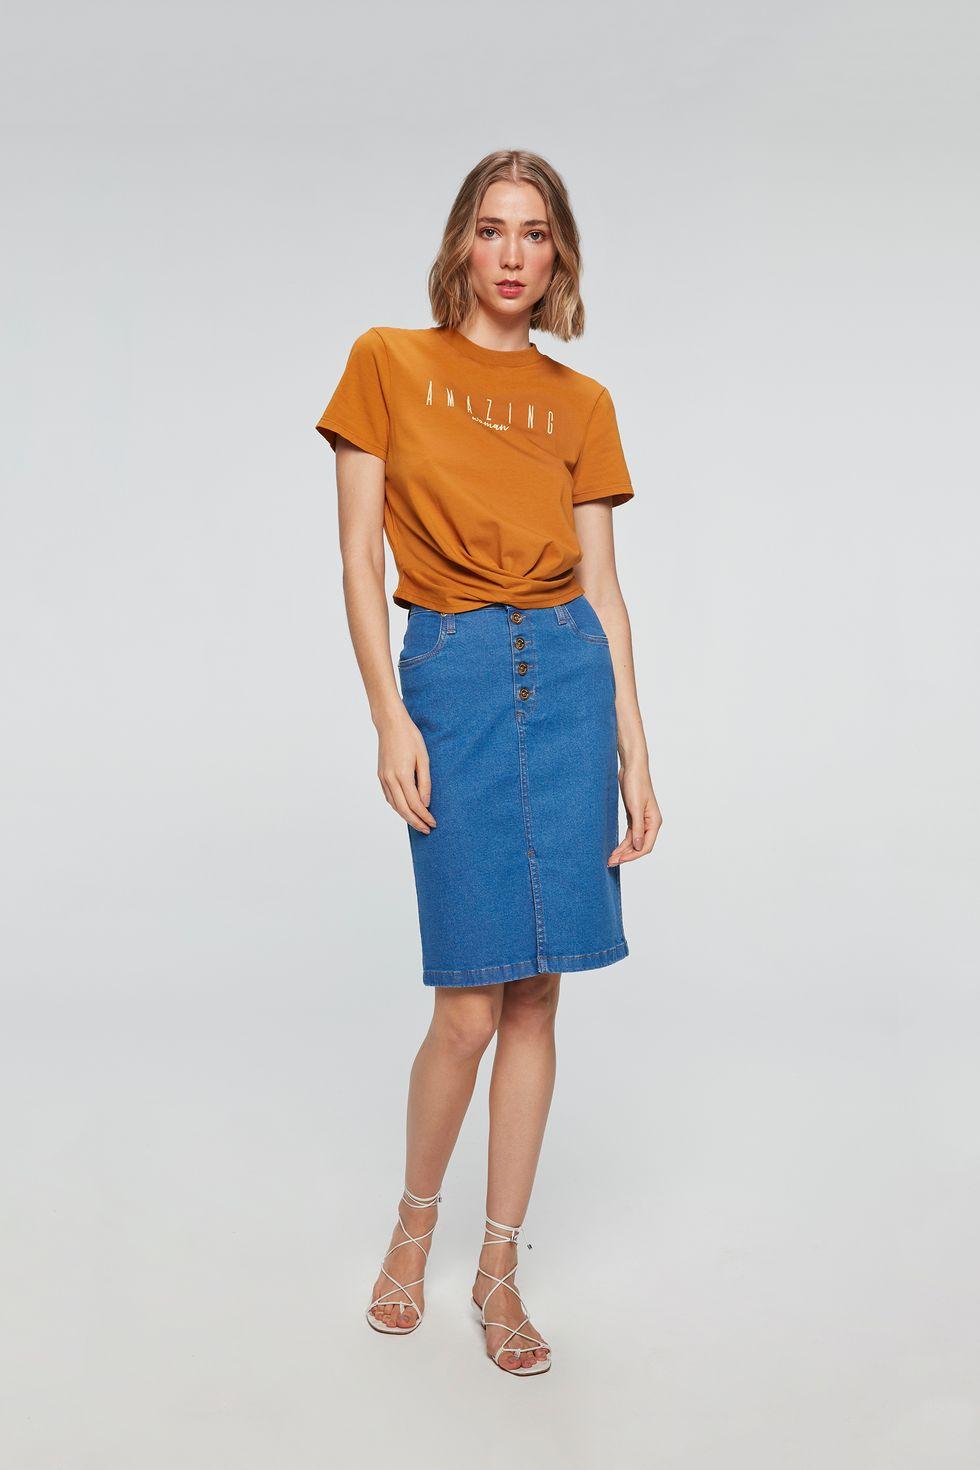 Look-Feminino-Saia-Jeans-Secretaria